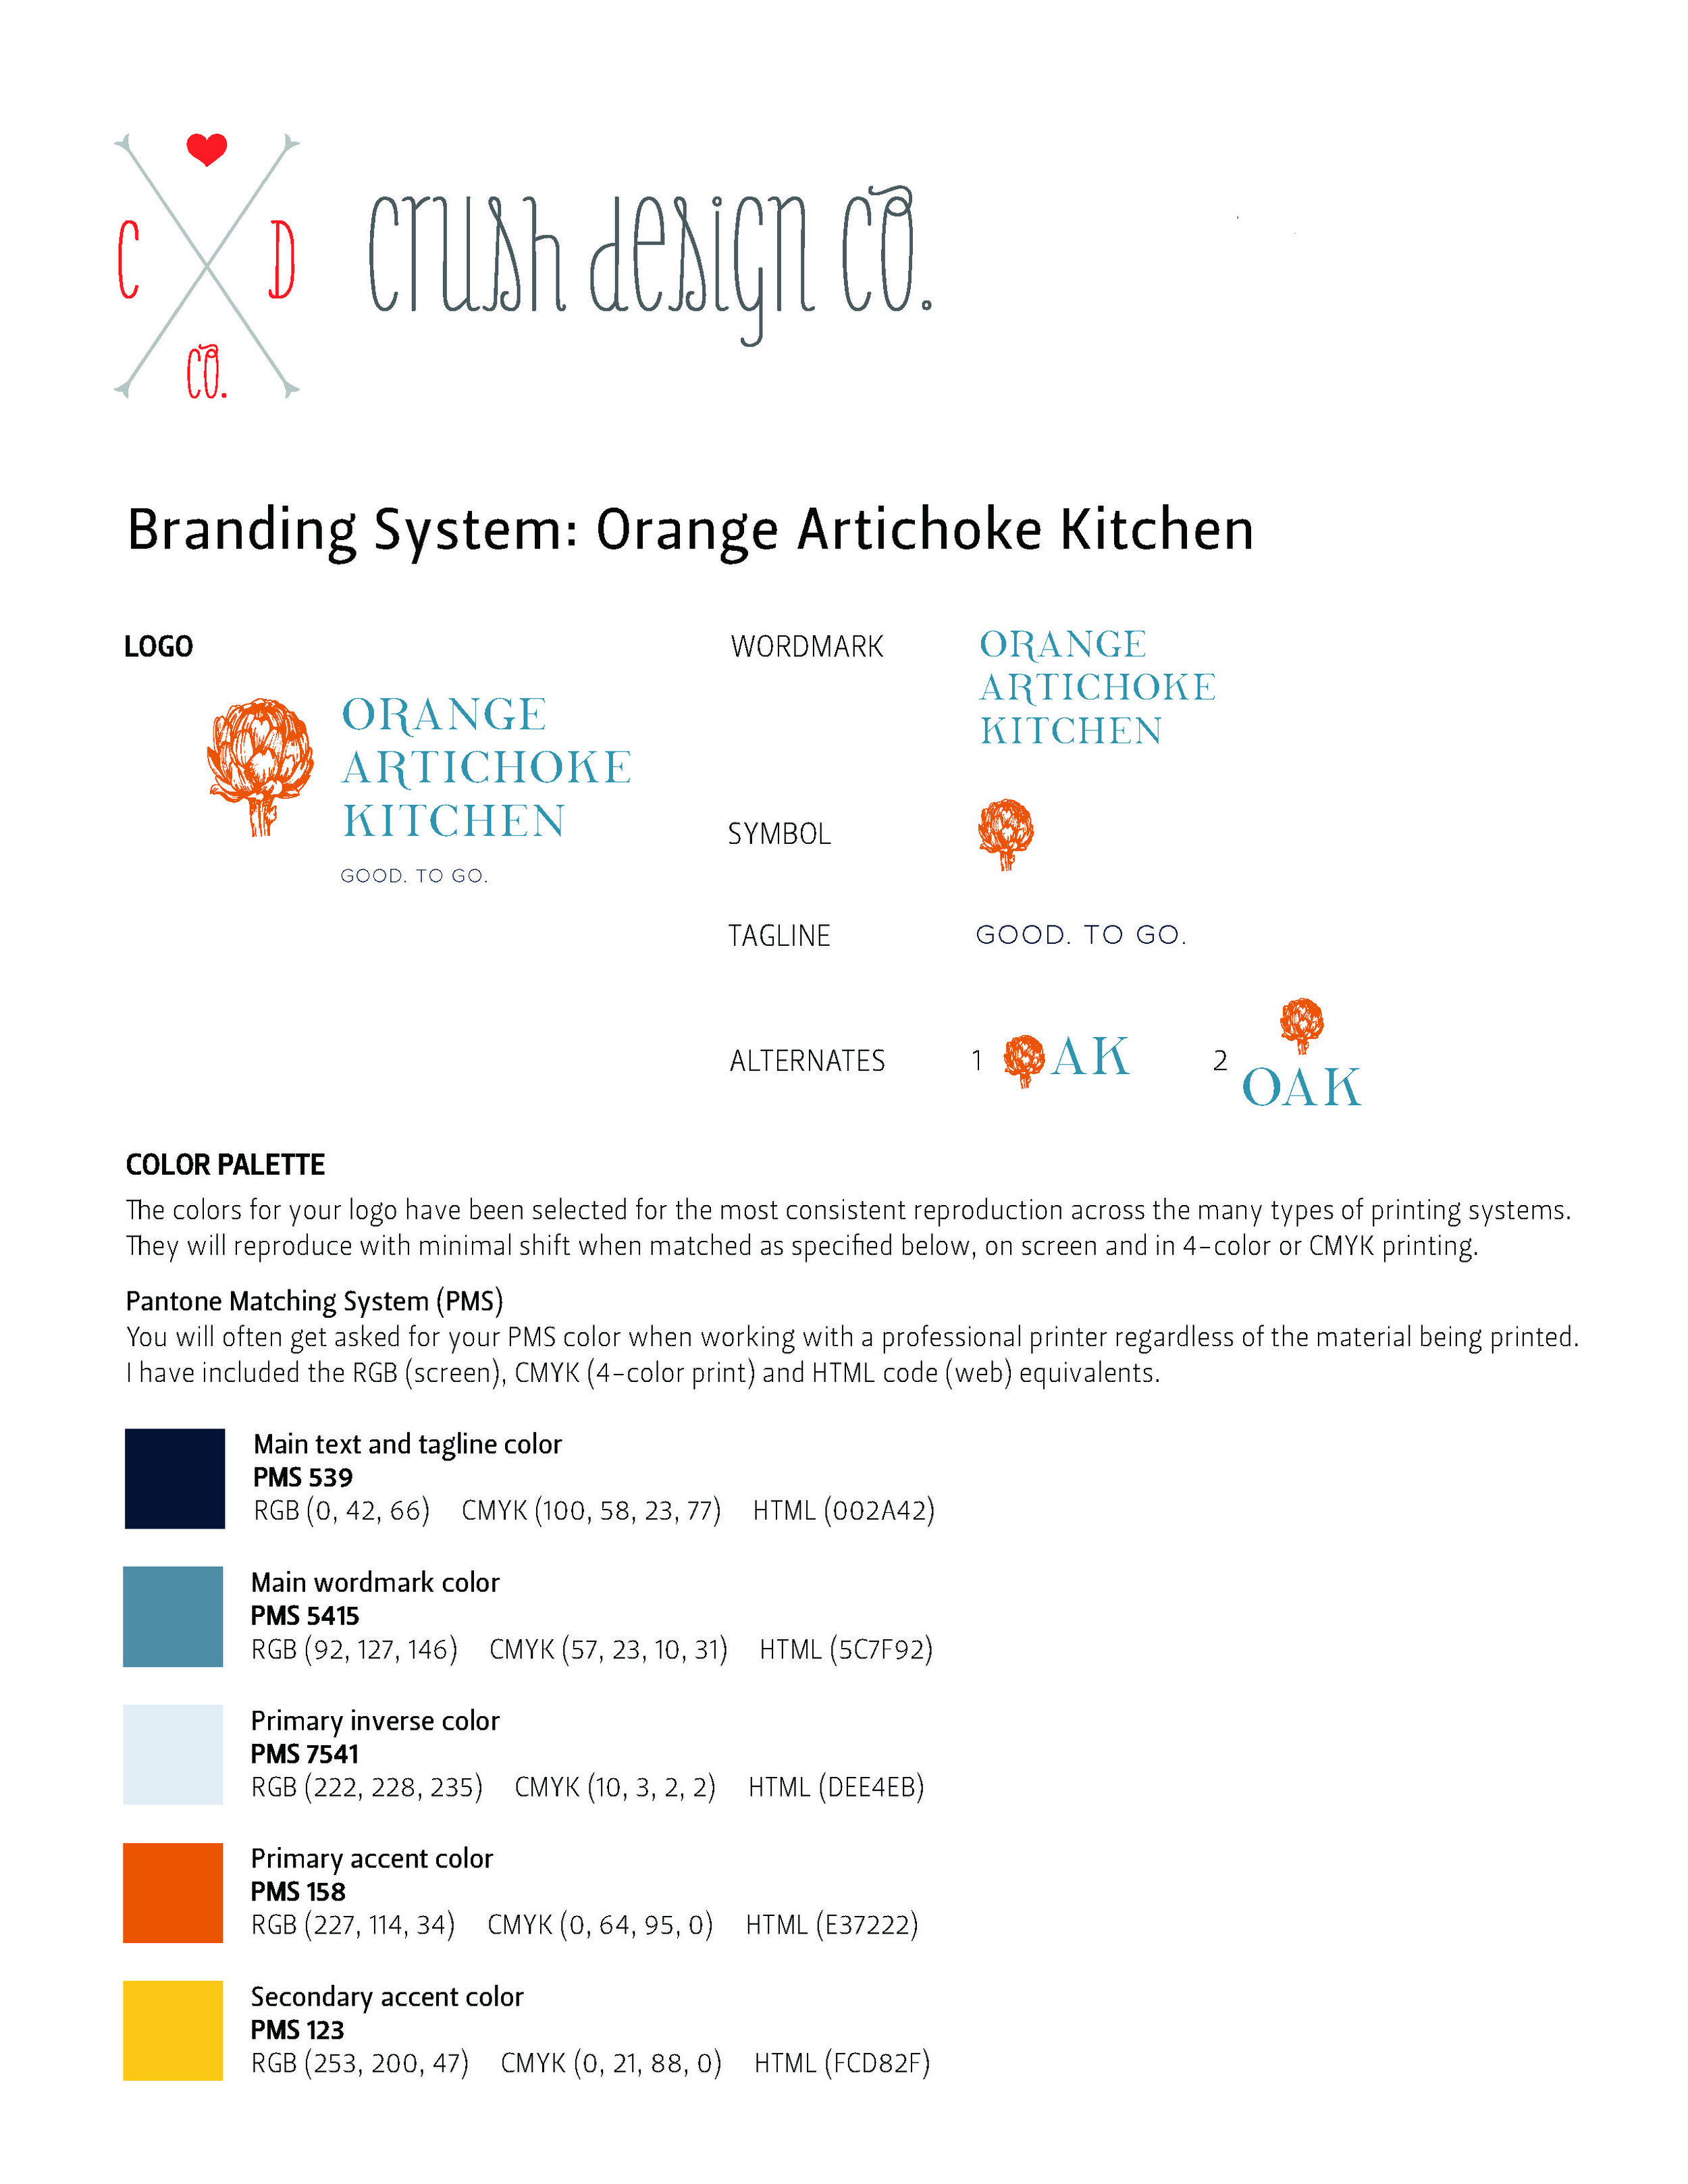 1 OAK-BrandingSystemSummary-101917.jpg